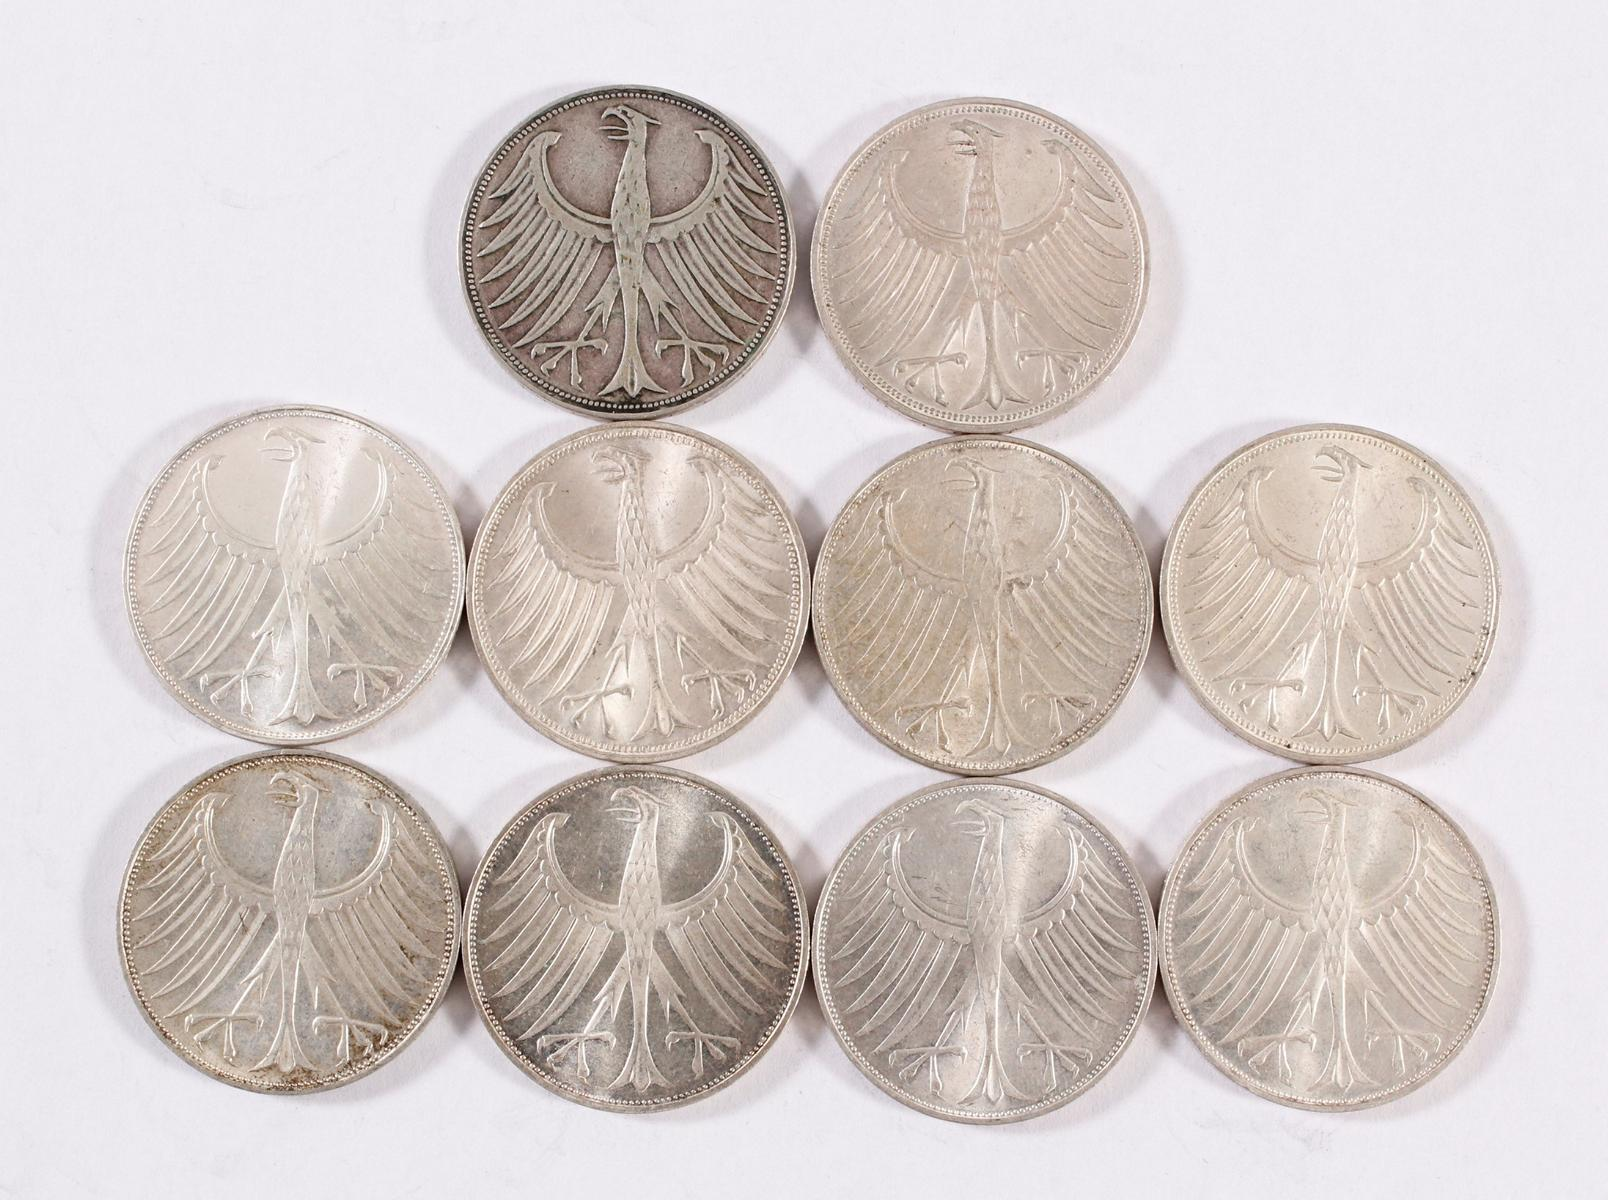 BRD 5 Mark Silberadler, 10 Stück-2